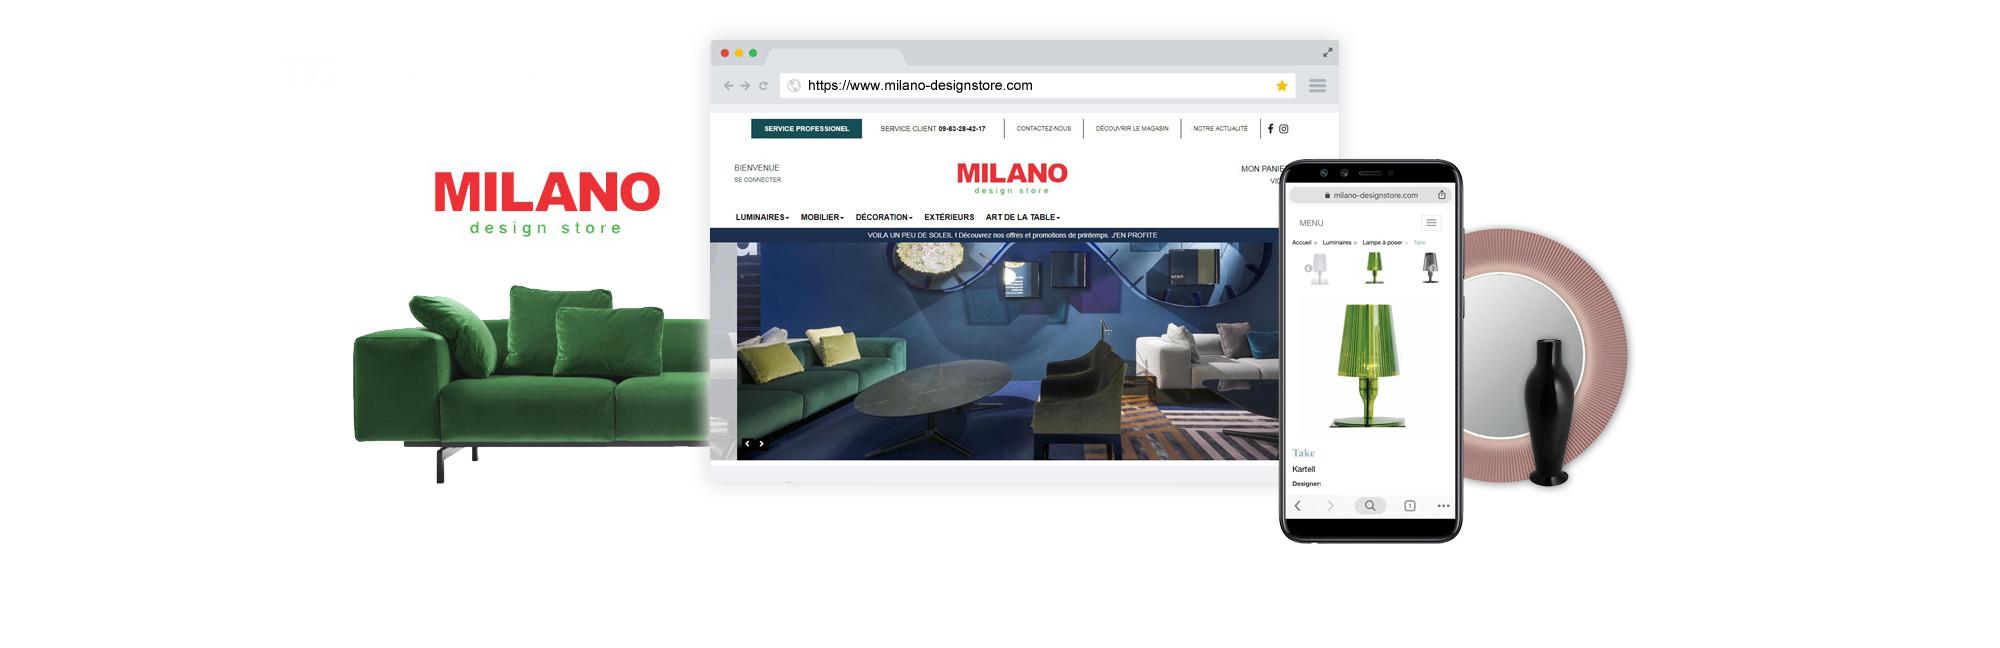 Milano-design-store